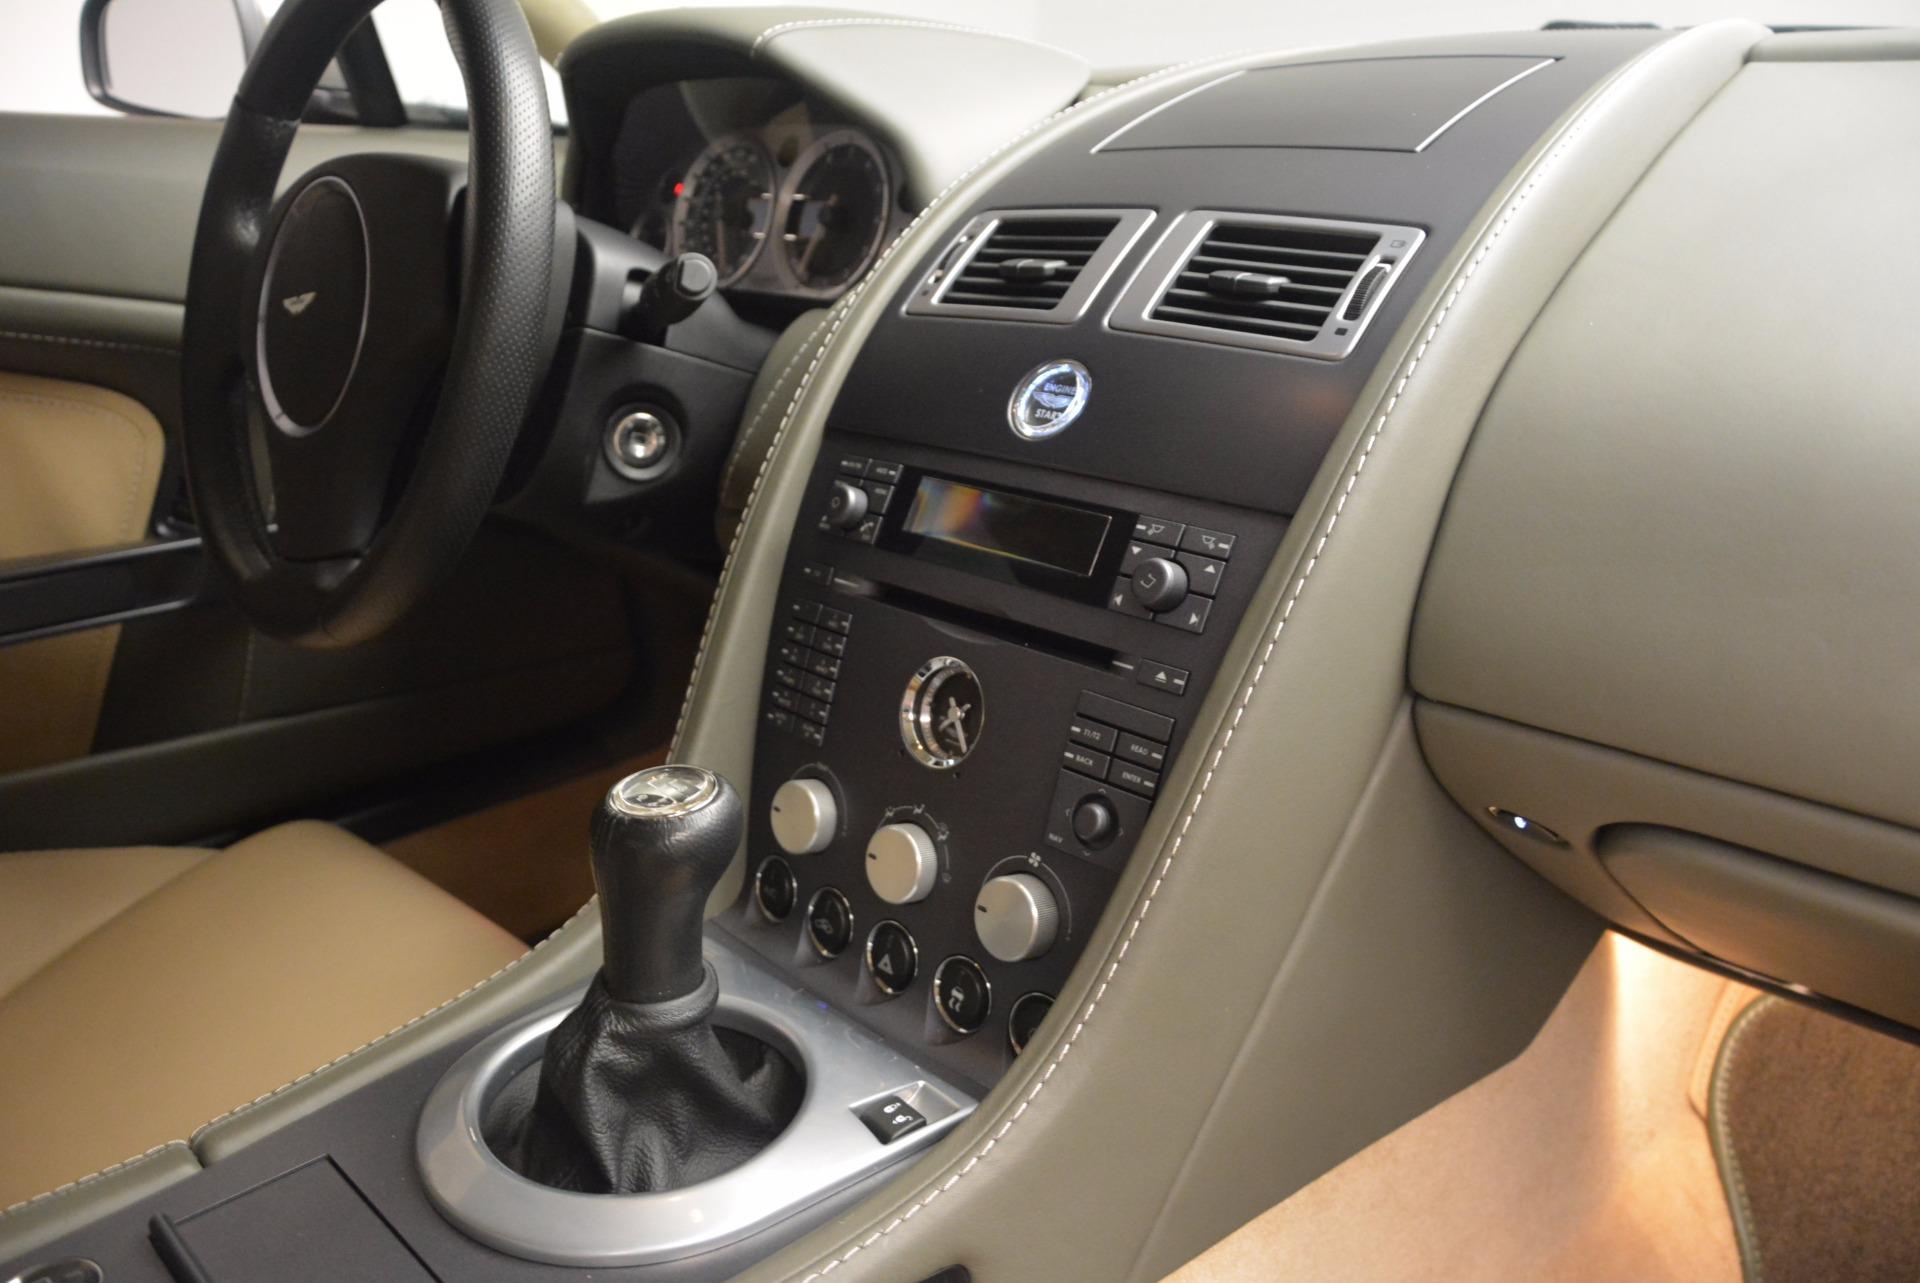 Used 2006 Aston Martin V8 Vantage  For Sale In Westport, CT 1658_p16